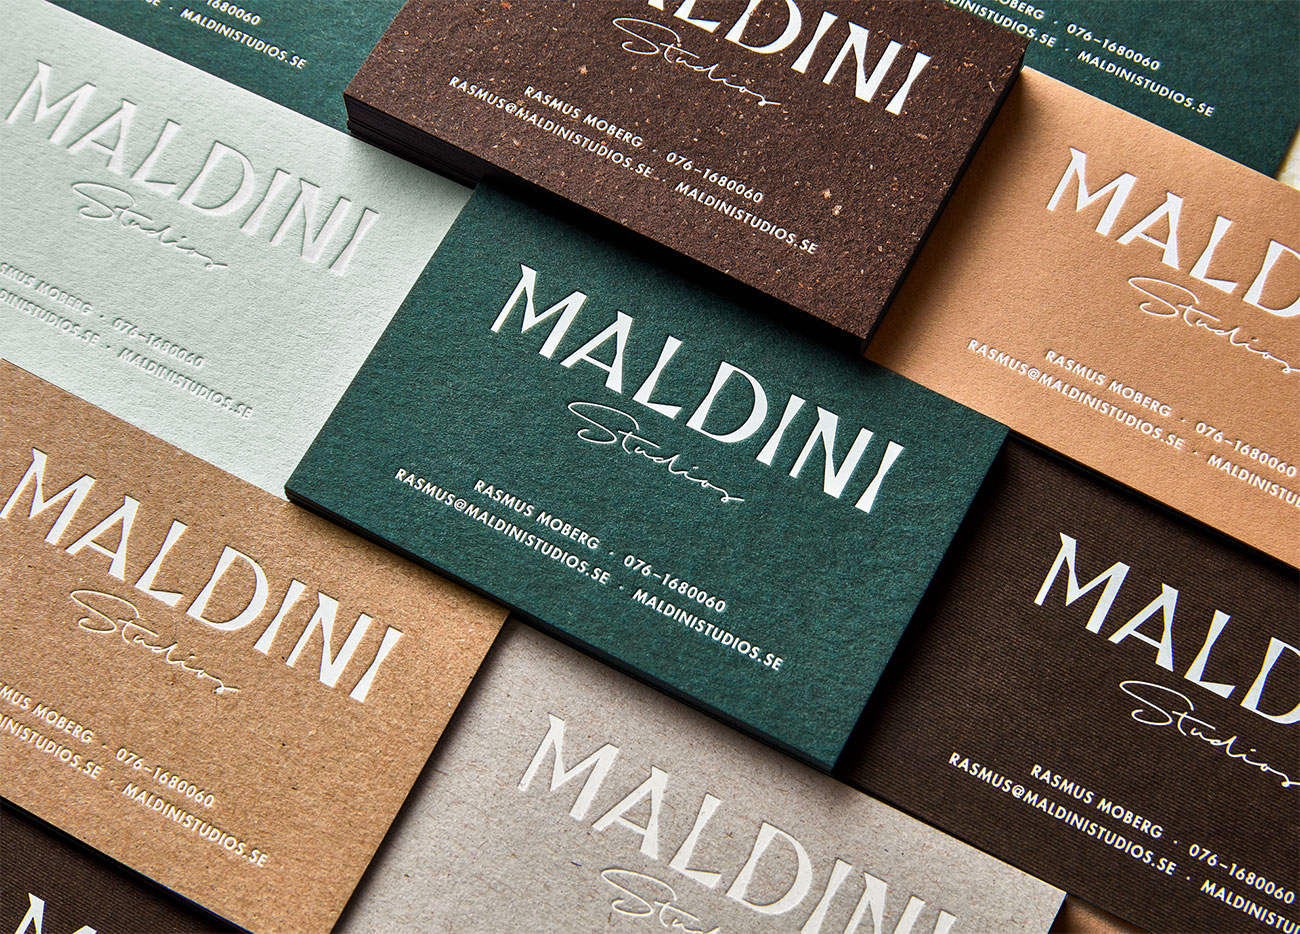 letterpress business cards: Maldini Studios